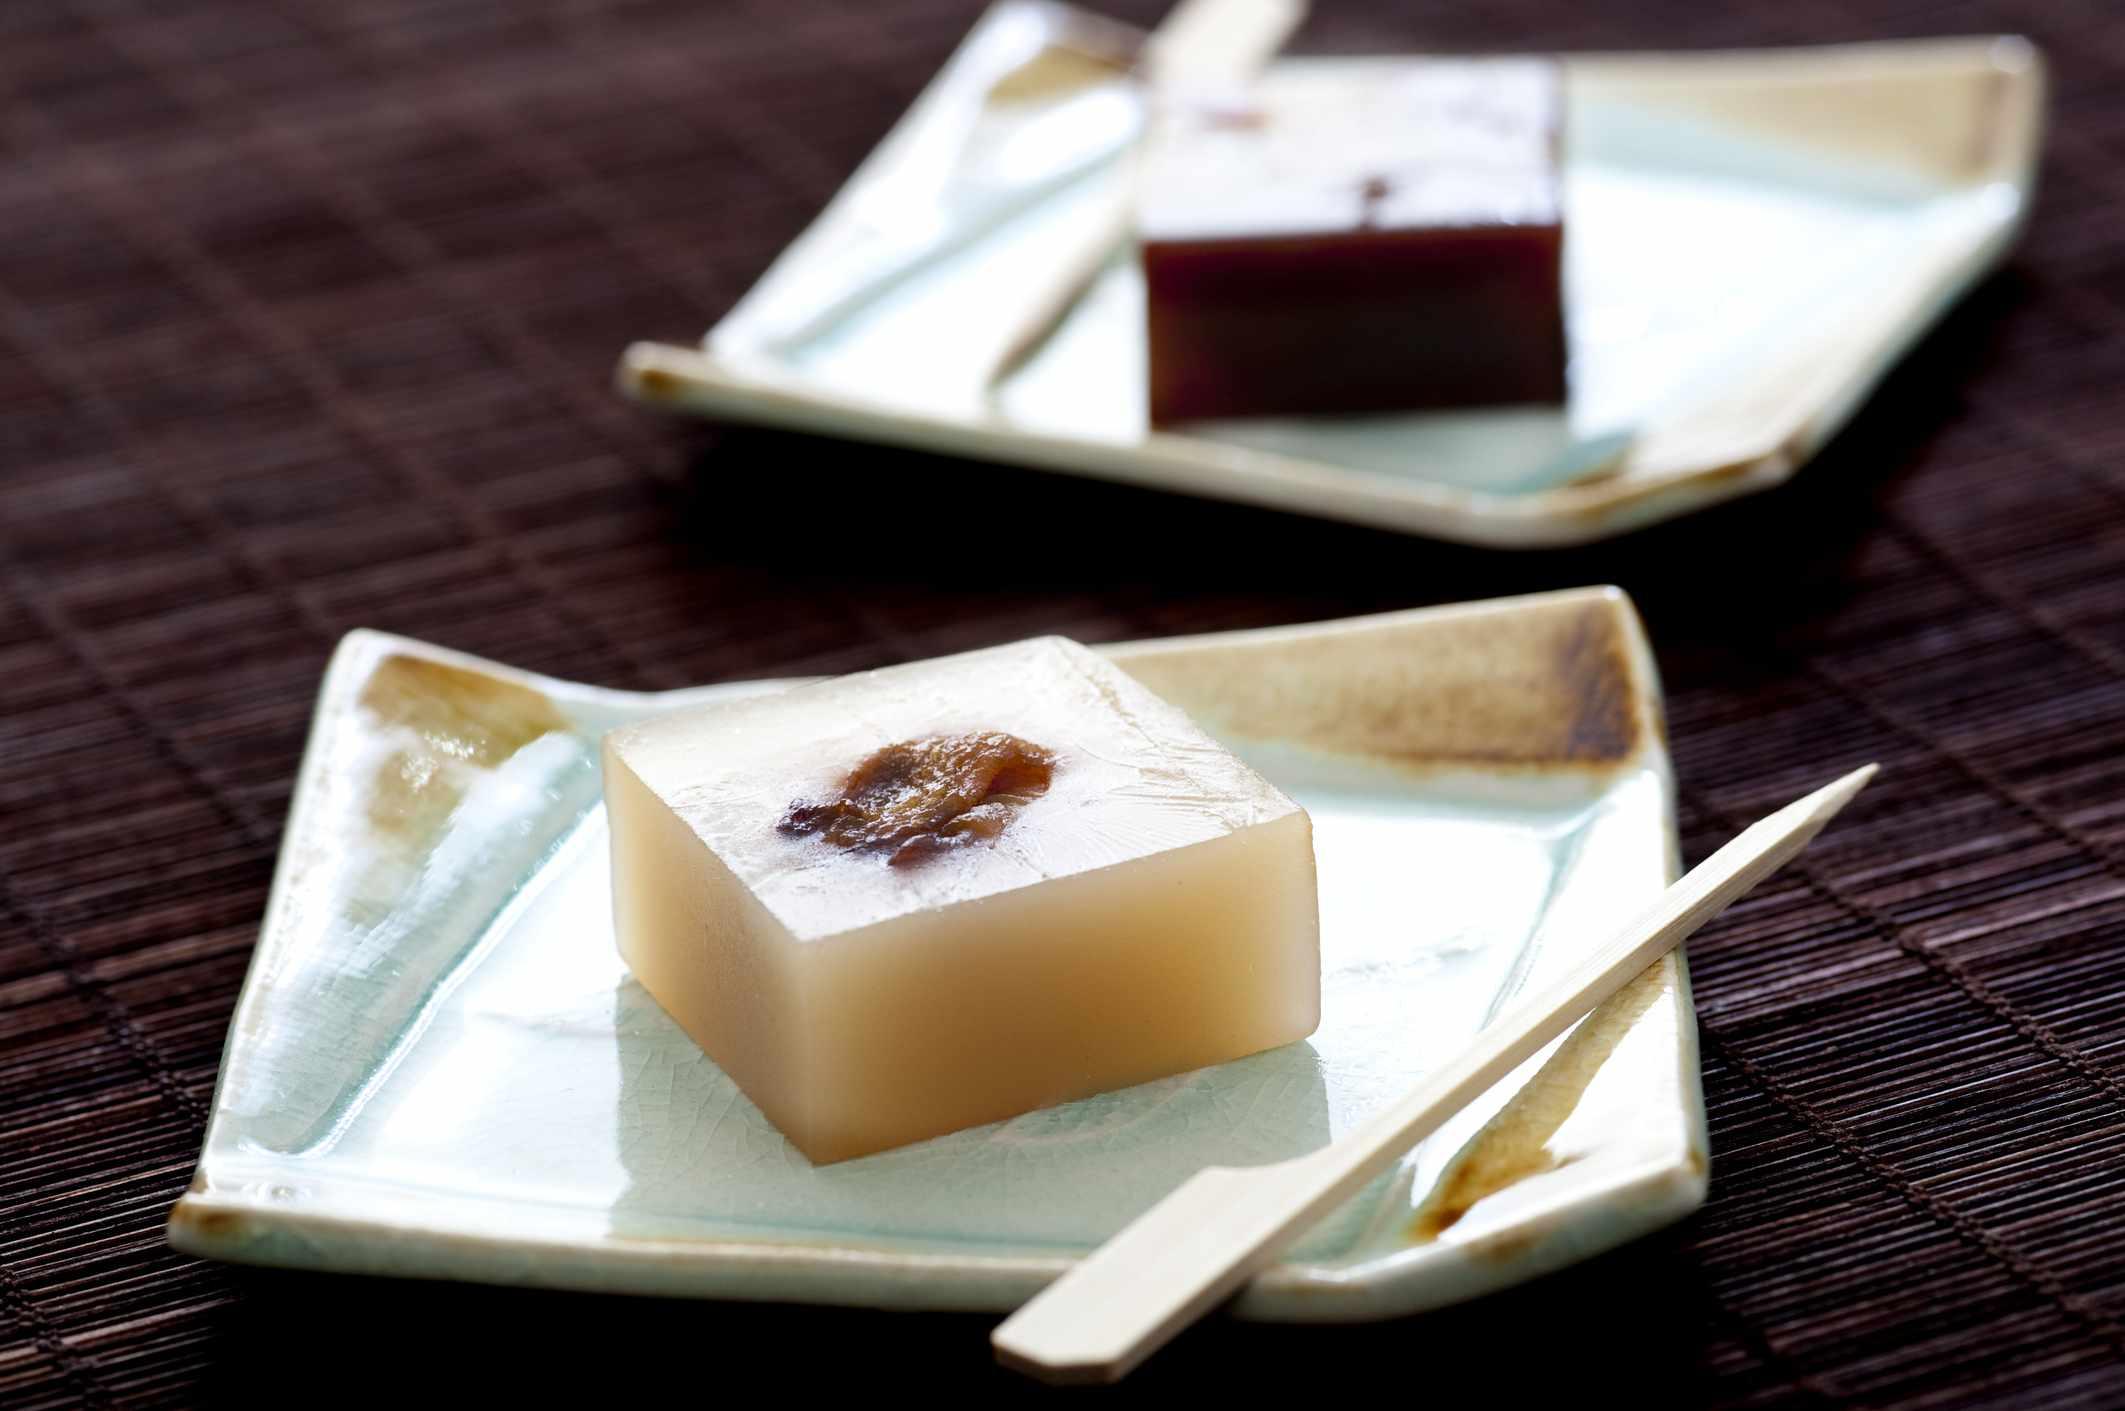 Yokan, a thick jellied dessert